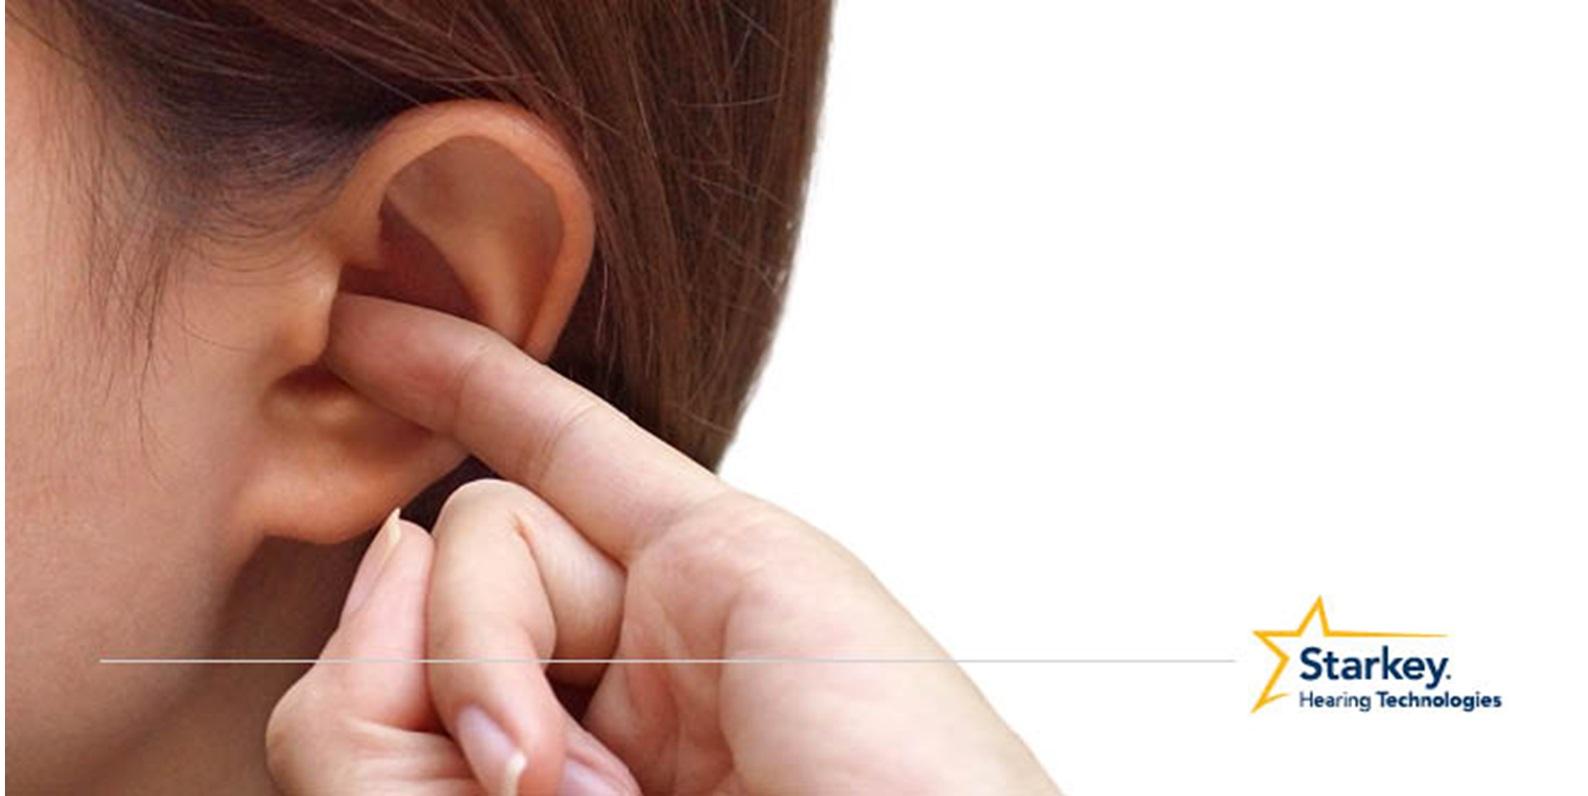 Barnstaple Ear wax removal